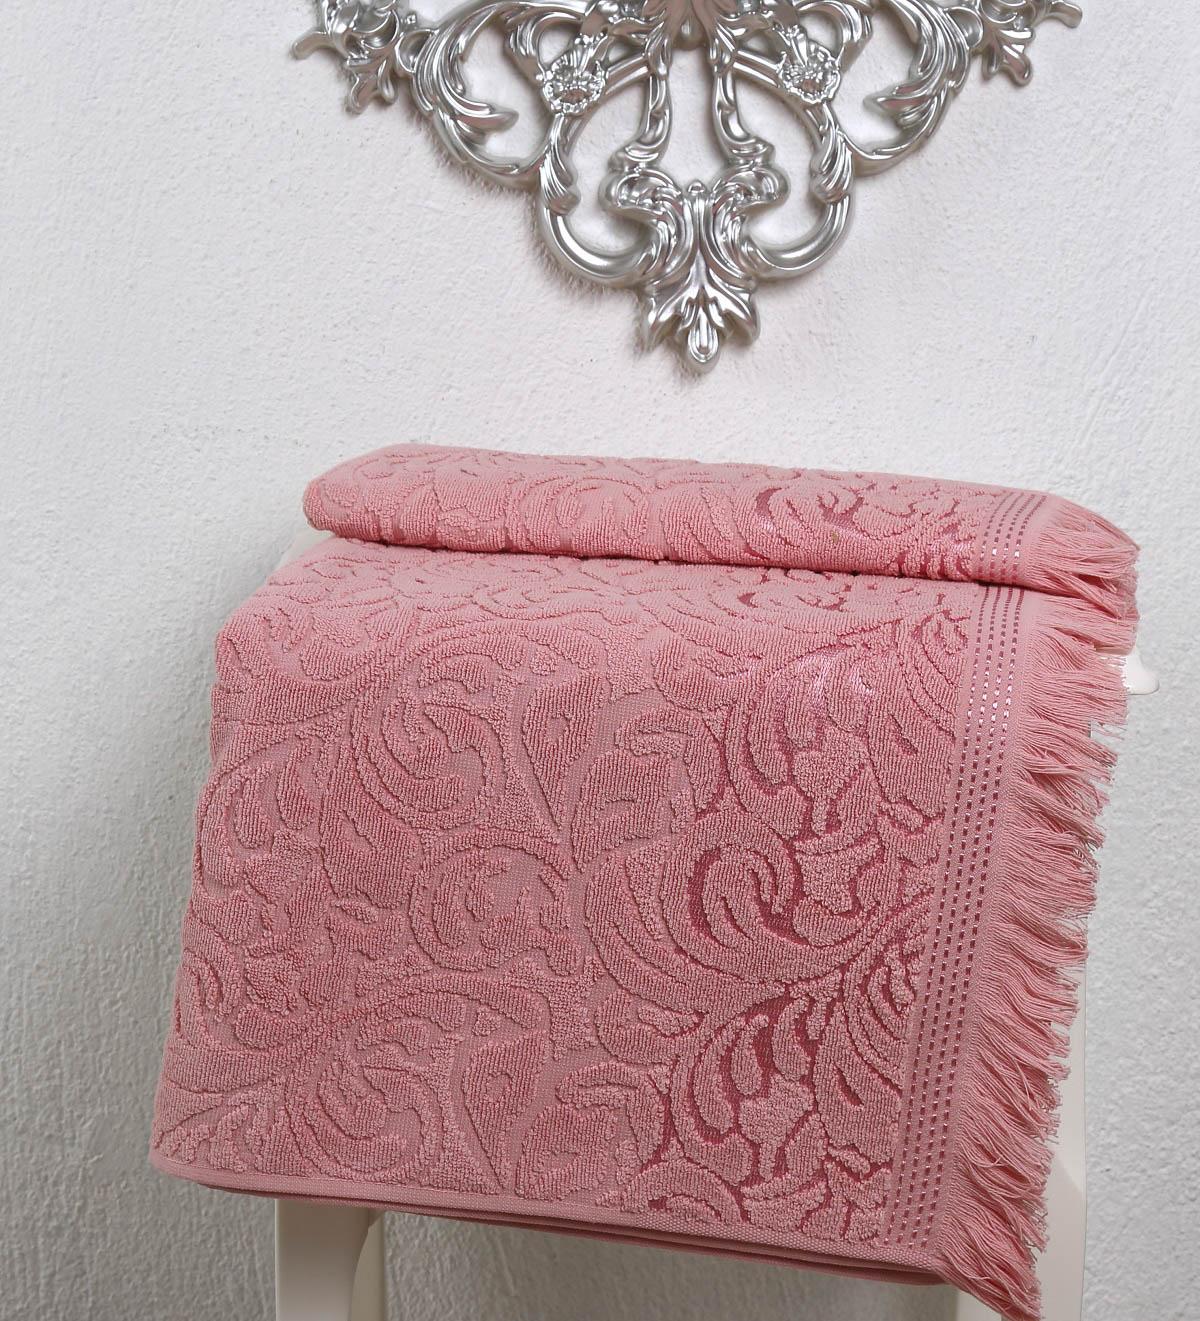 Полотенца Karna Полотенце Esra Цвет: Розовый (70х140 см) комплект махровых полотенец karna esra 50x90 70х140 см 1158865